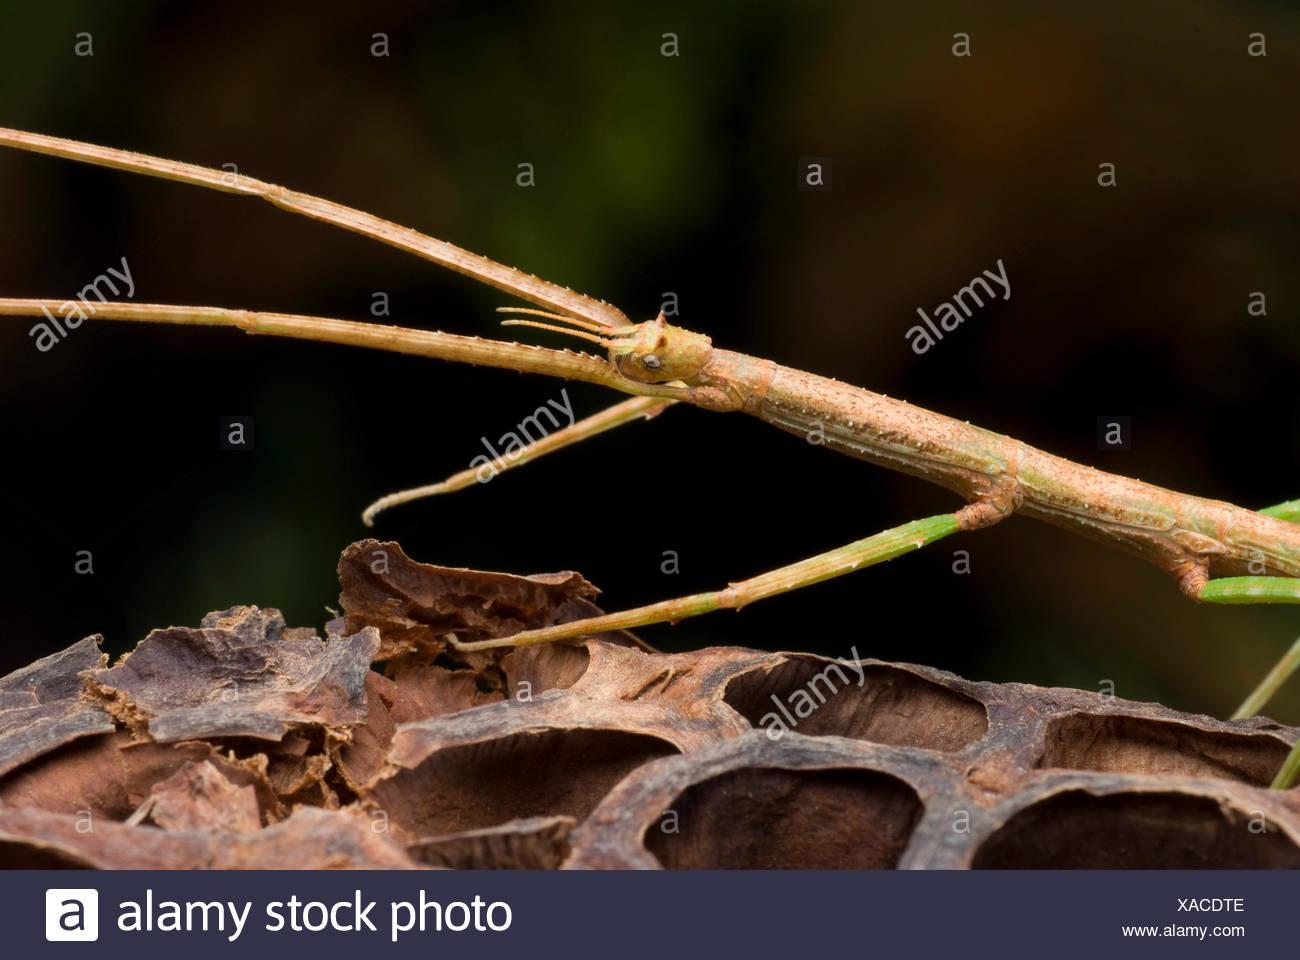 Vietnamese Stick Bug (Ramulus artemis, Baculum artemis), on a seed vessel - Stock Image